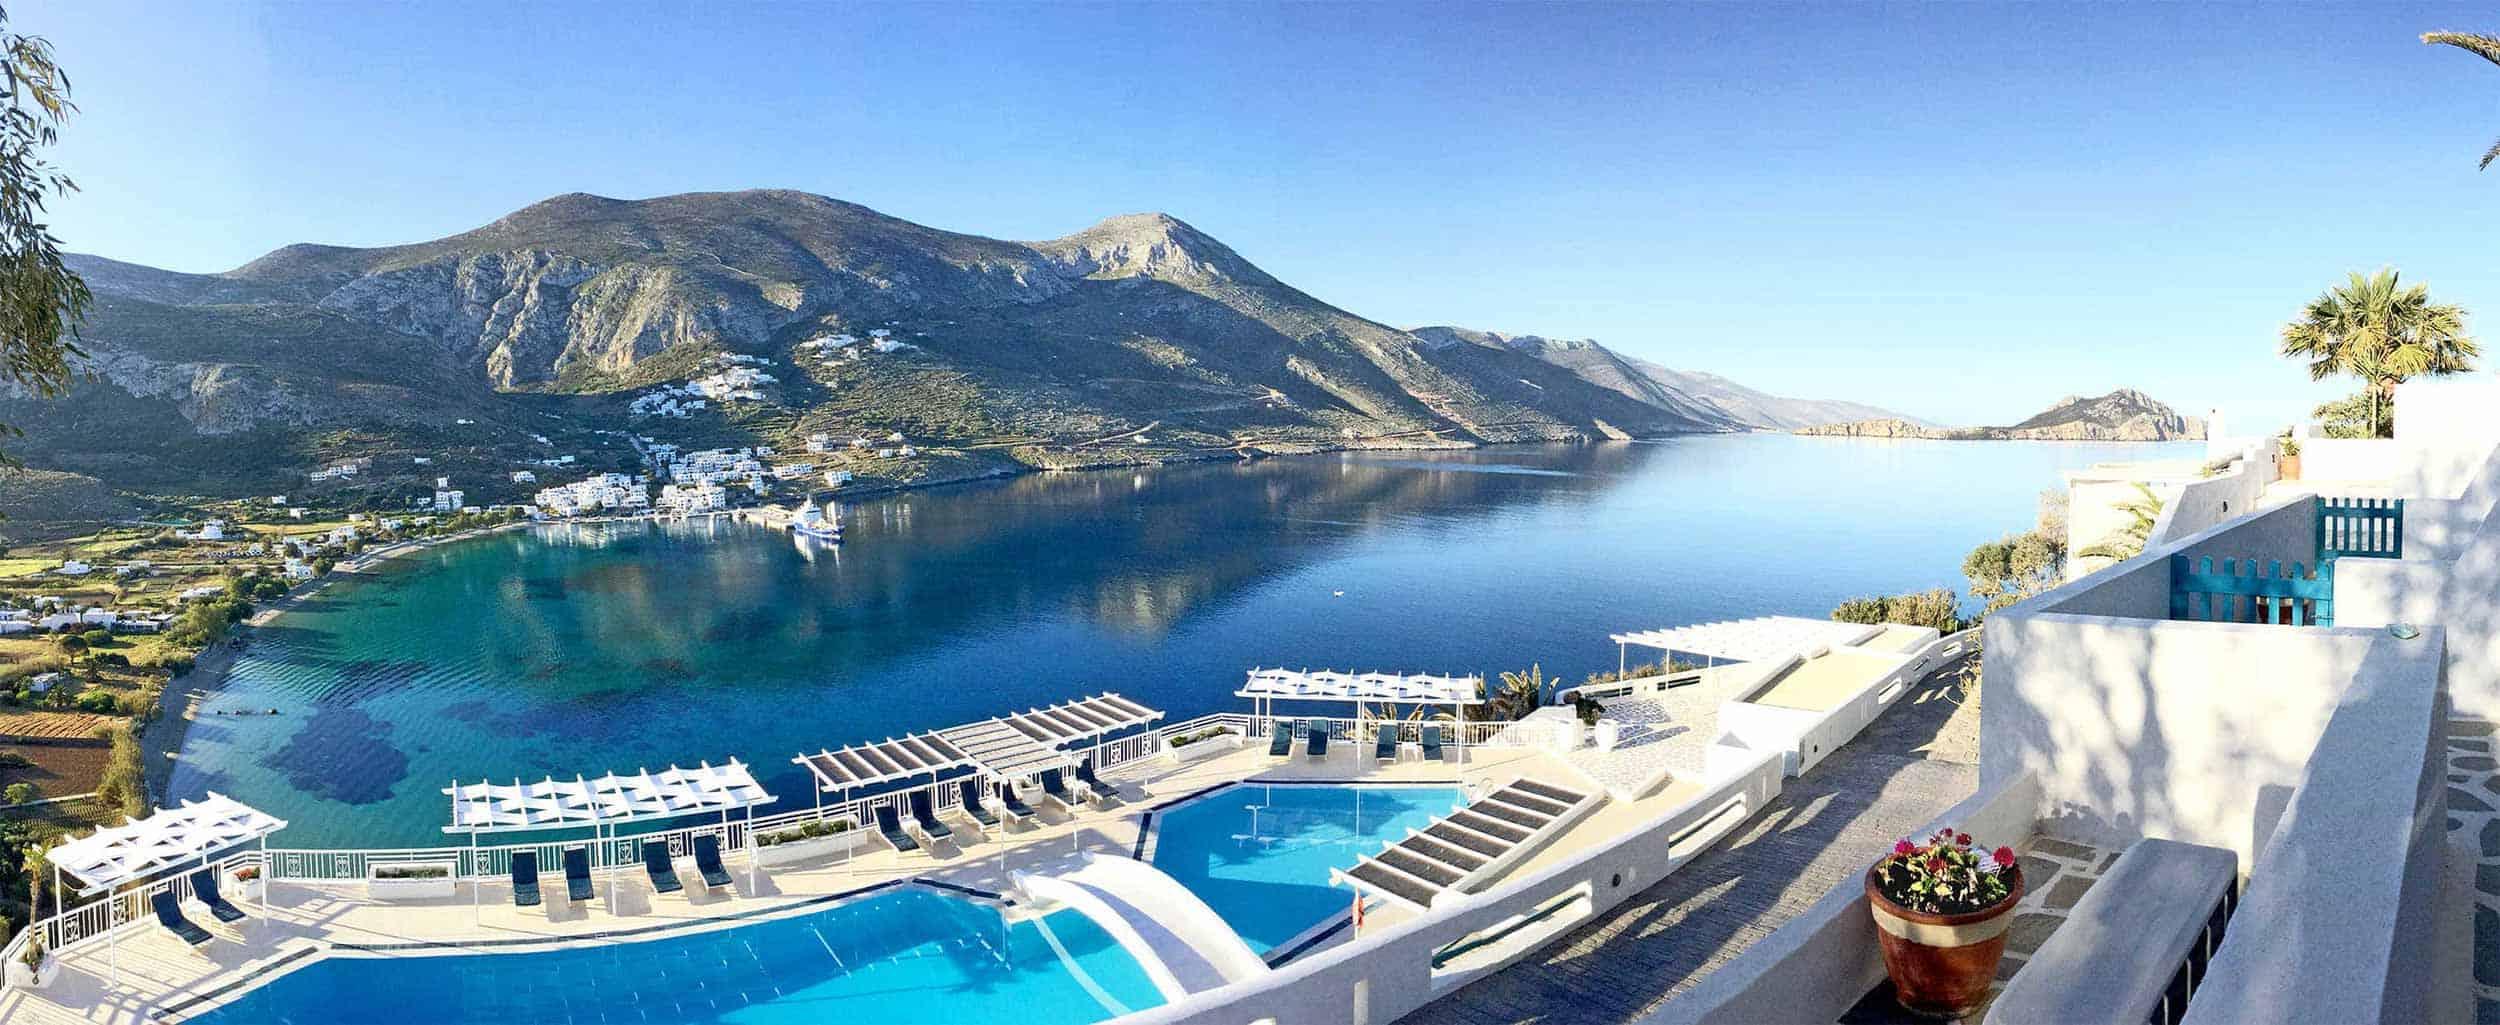 aegialis-hotel-and-spa-aegean-greece-6.jpg